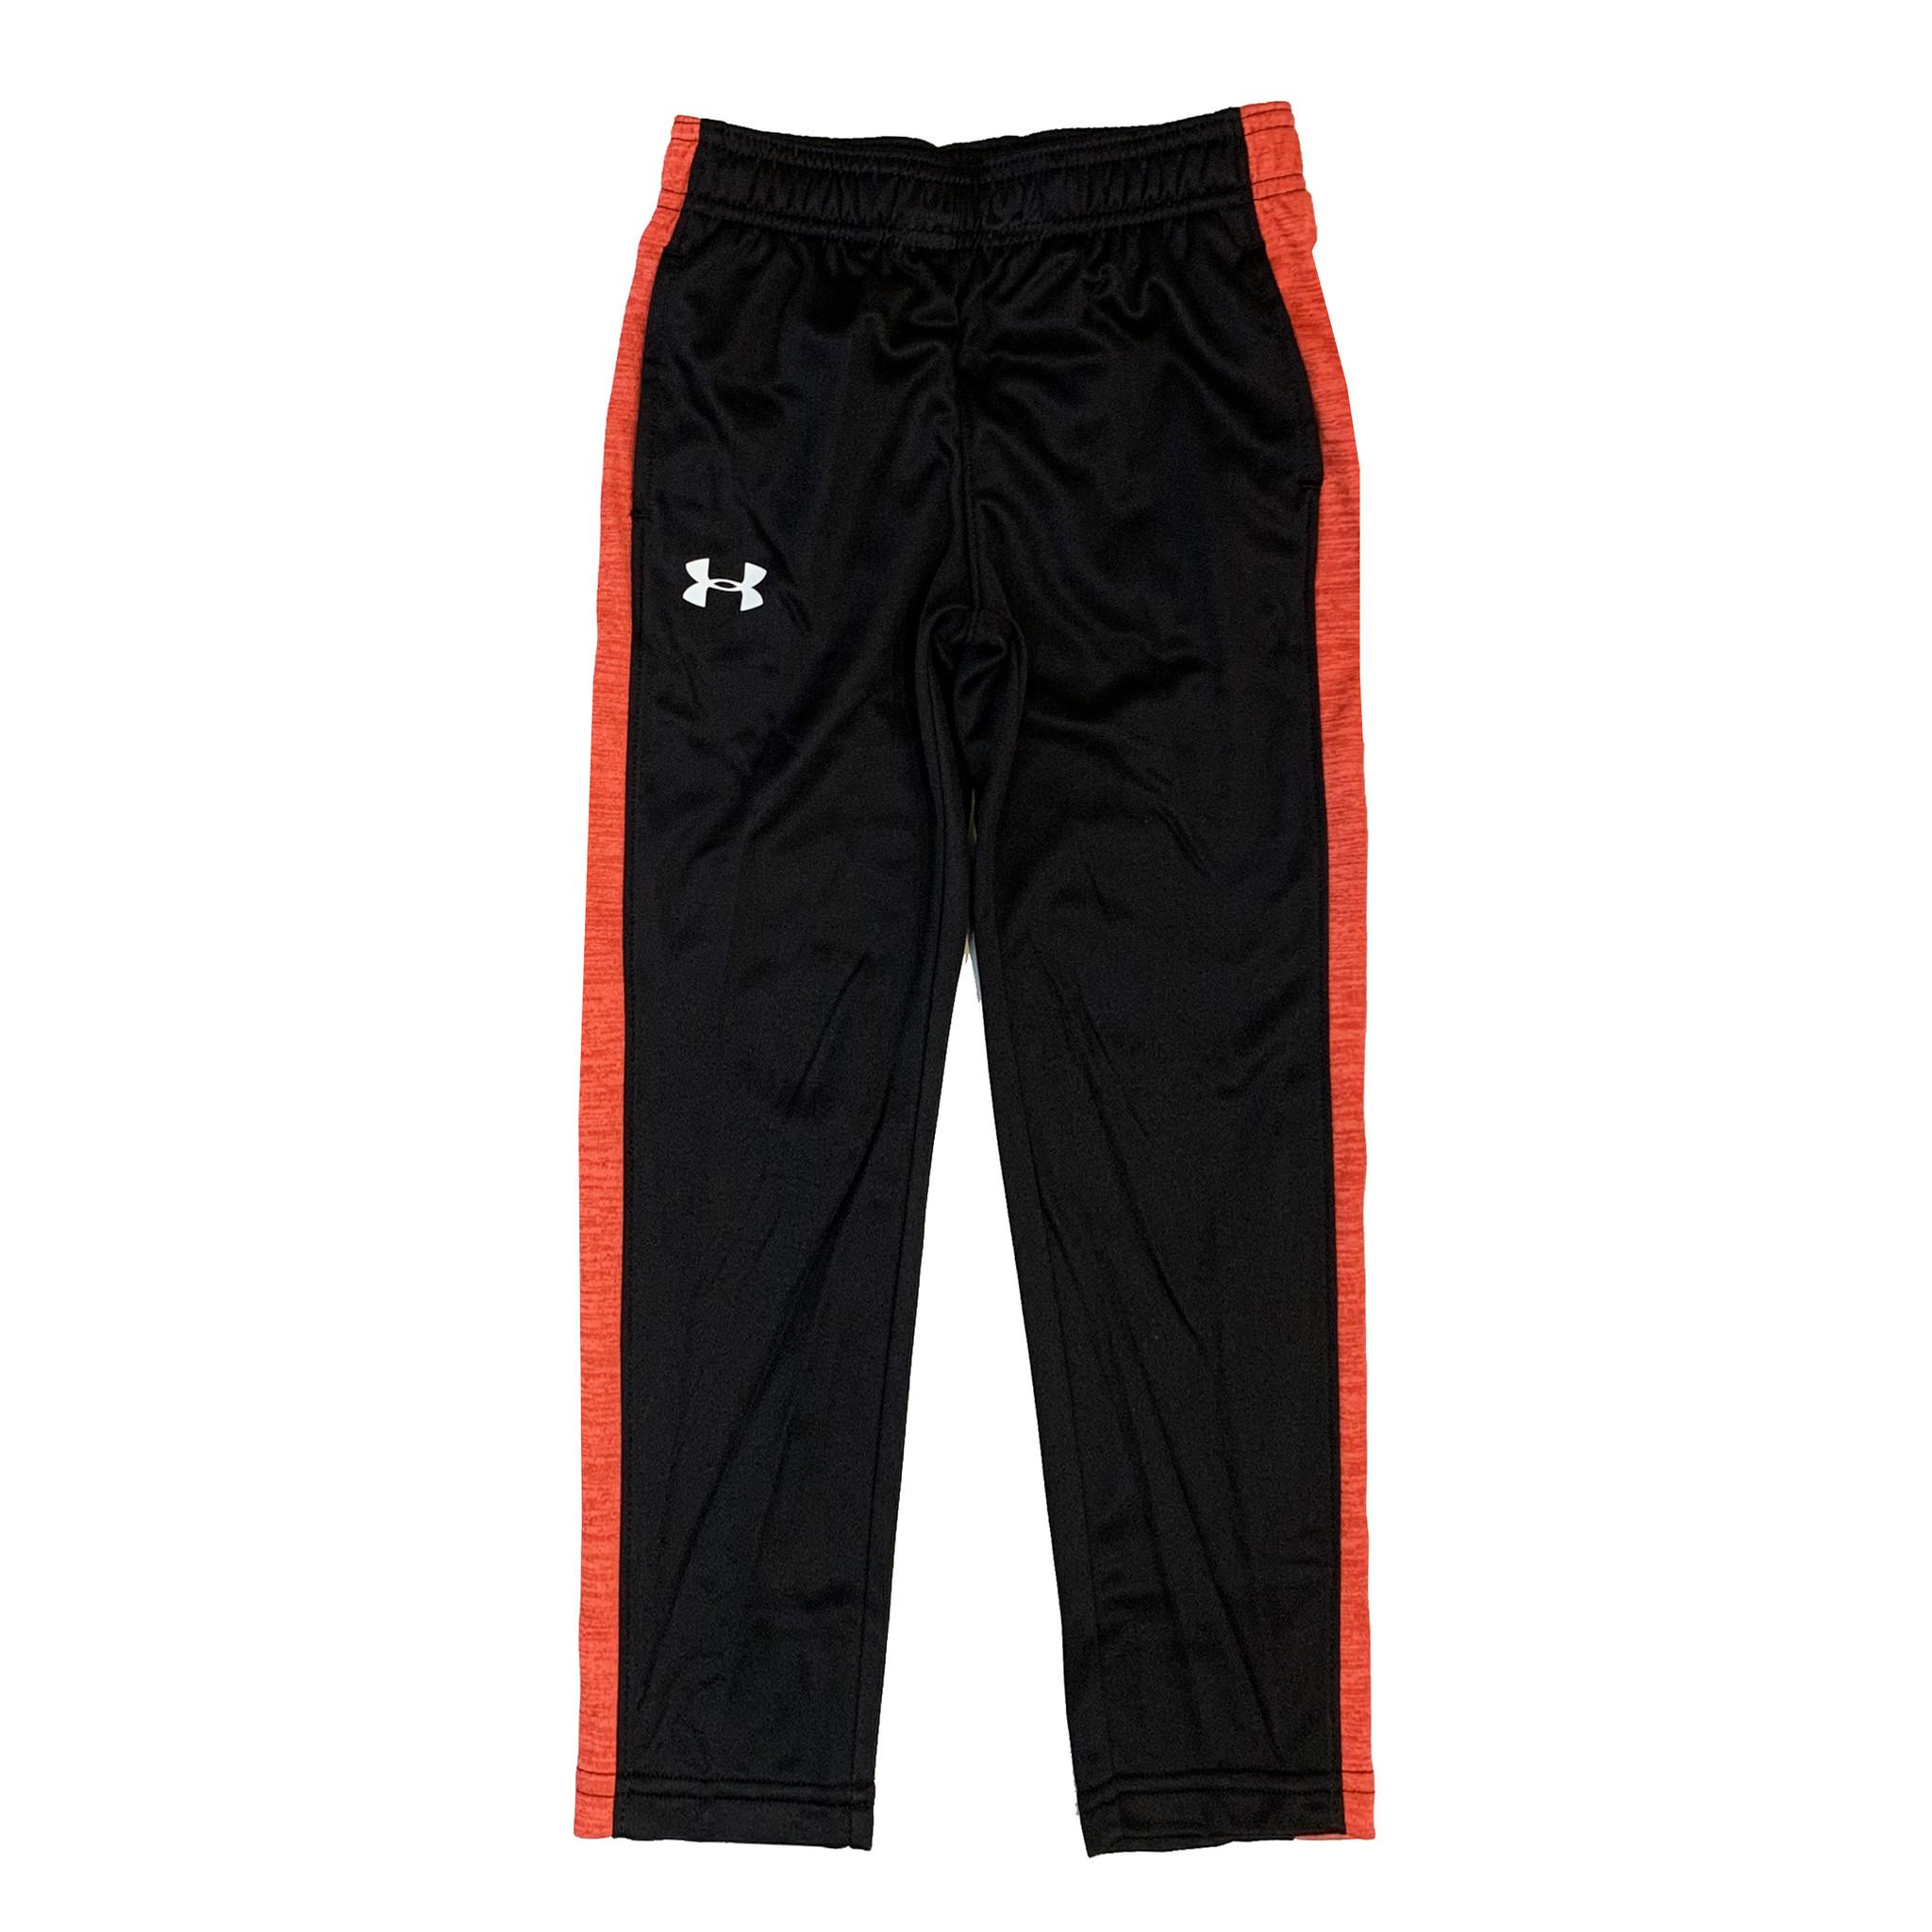 Under Armour Orange & Red Heathered Stripe Pant